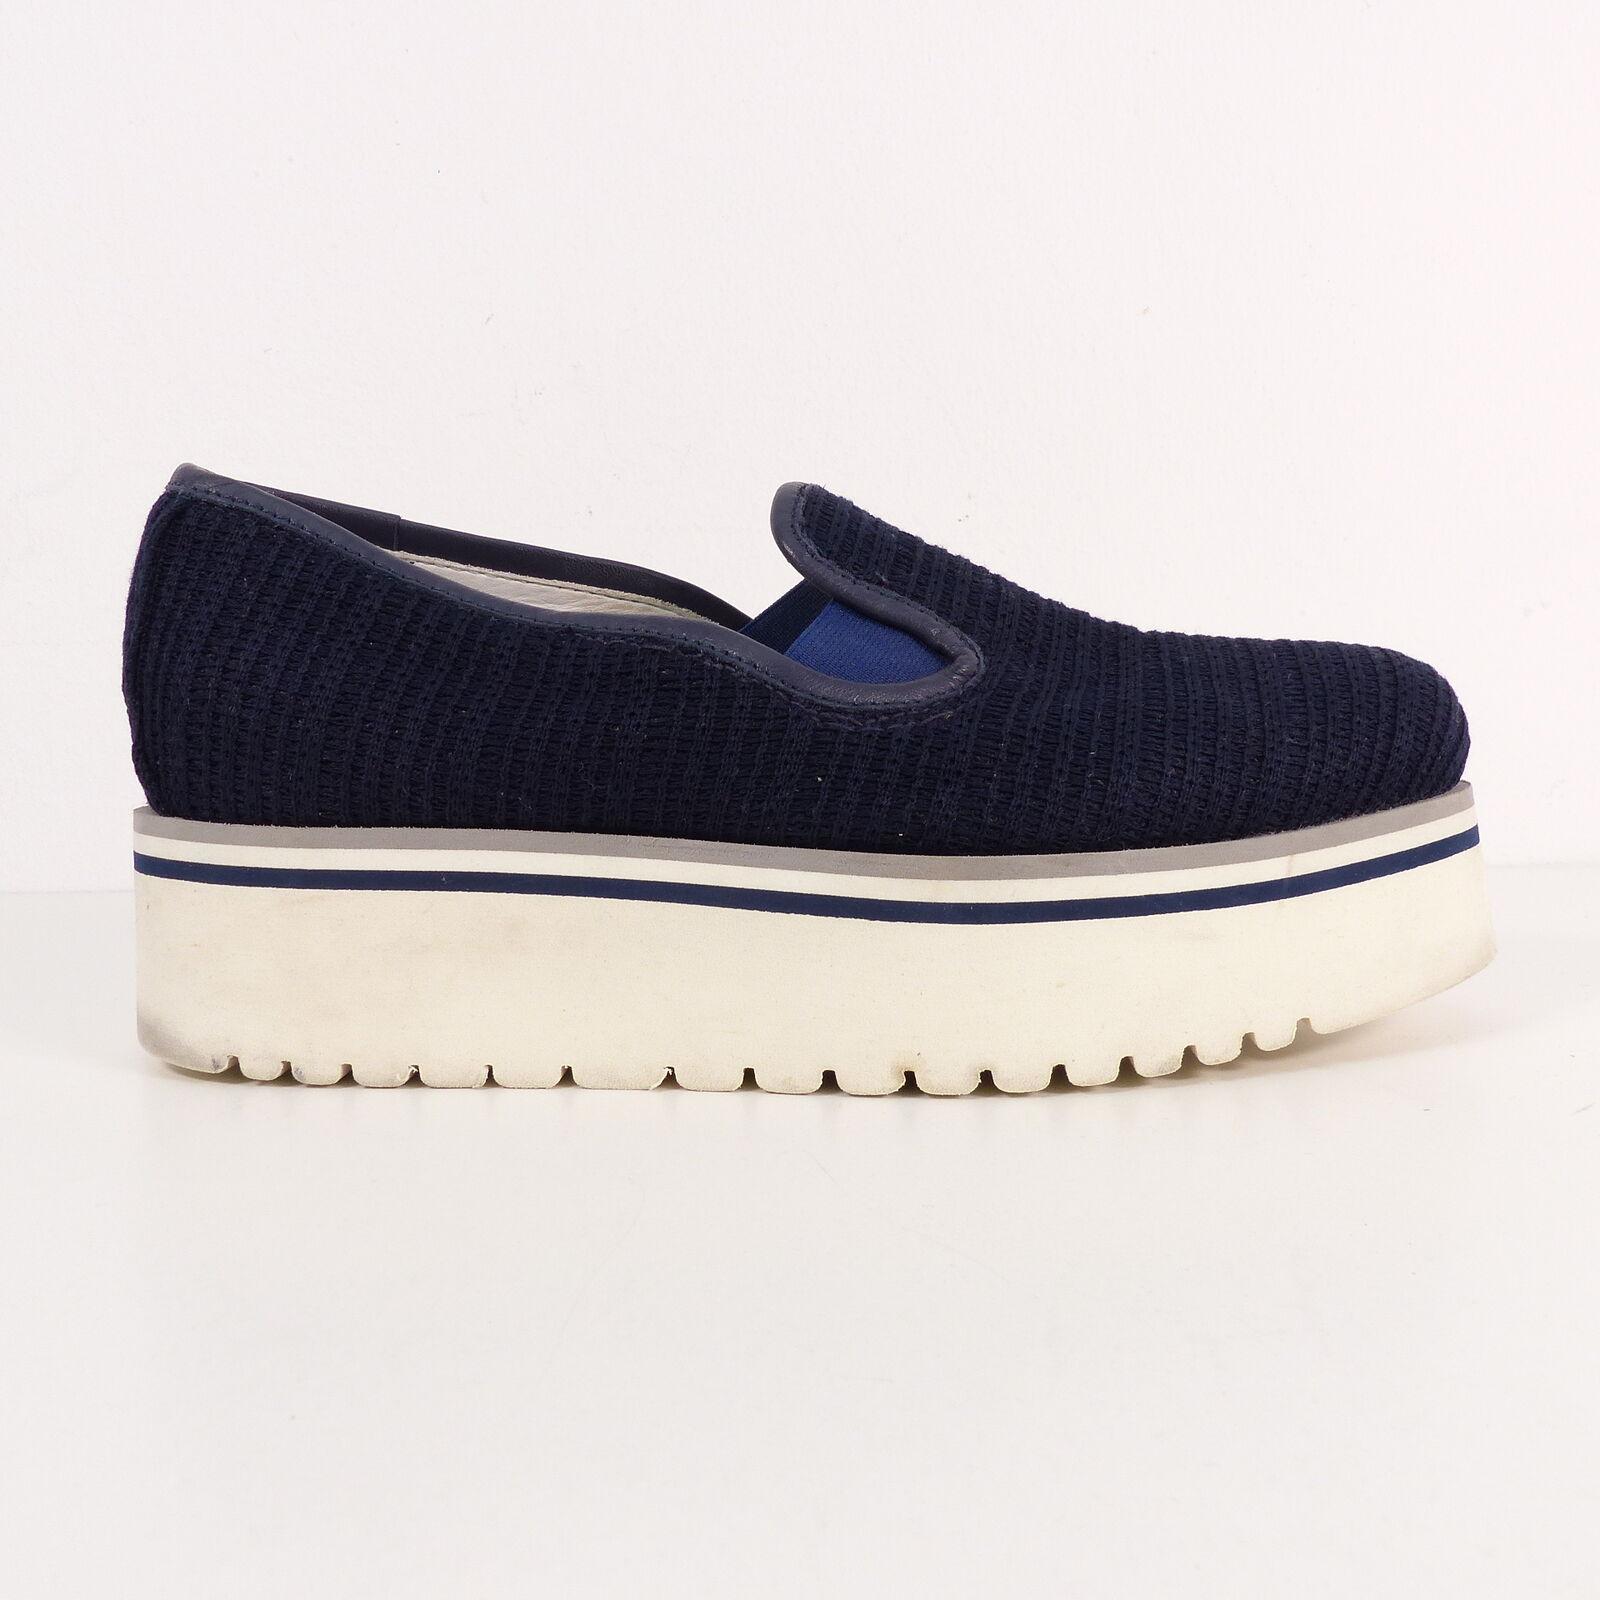 Dundup Mocassini Donna Scarpe Plateau Blu EU 39 mokasins scarpe